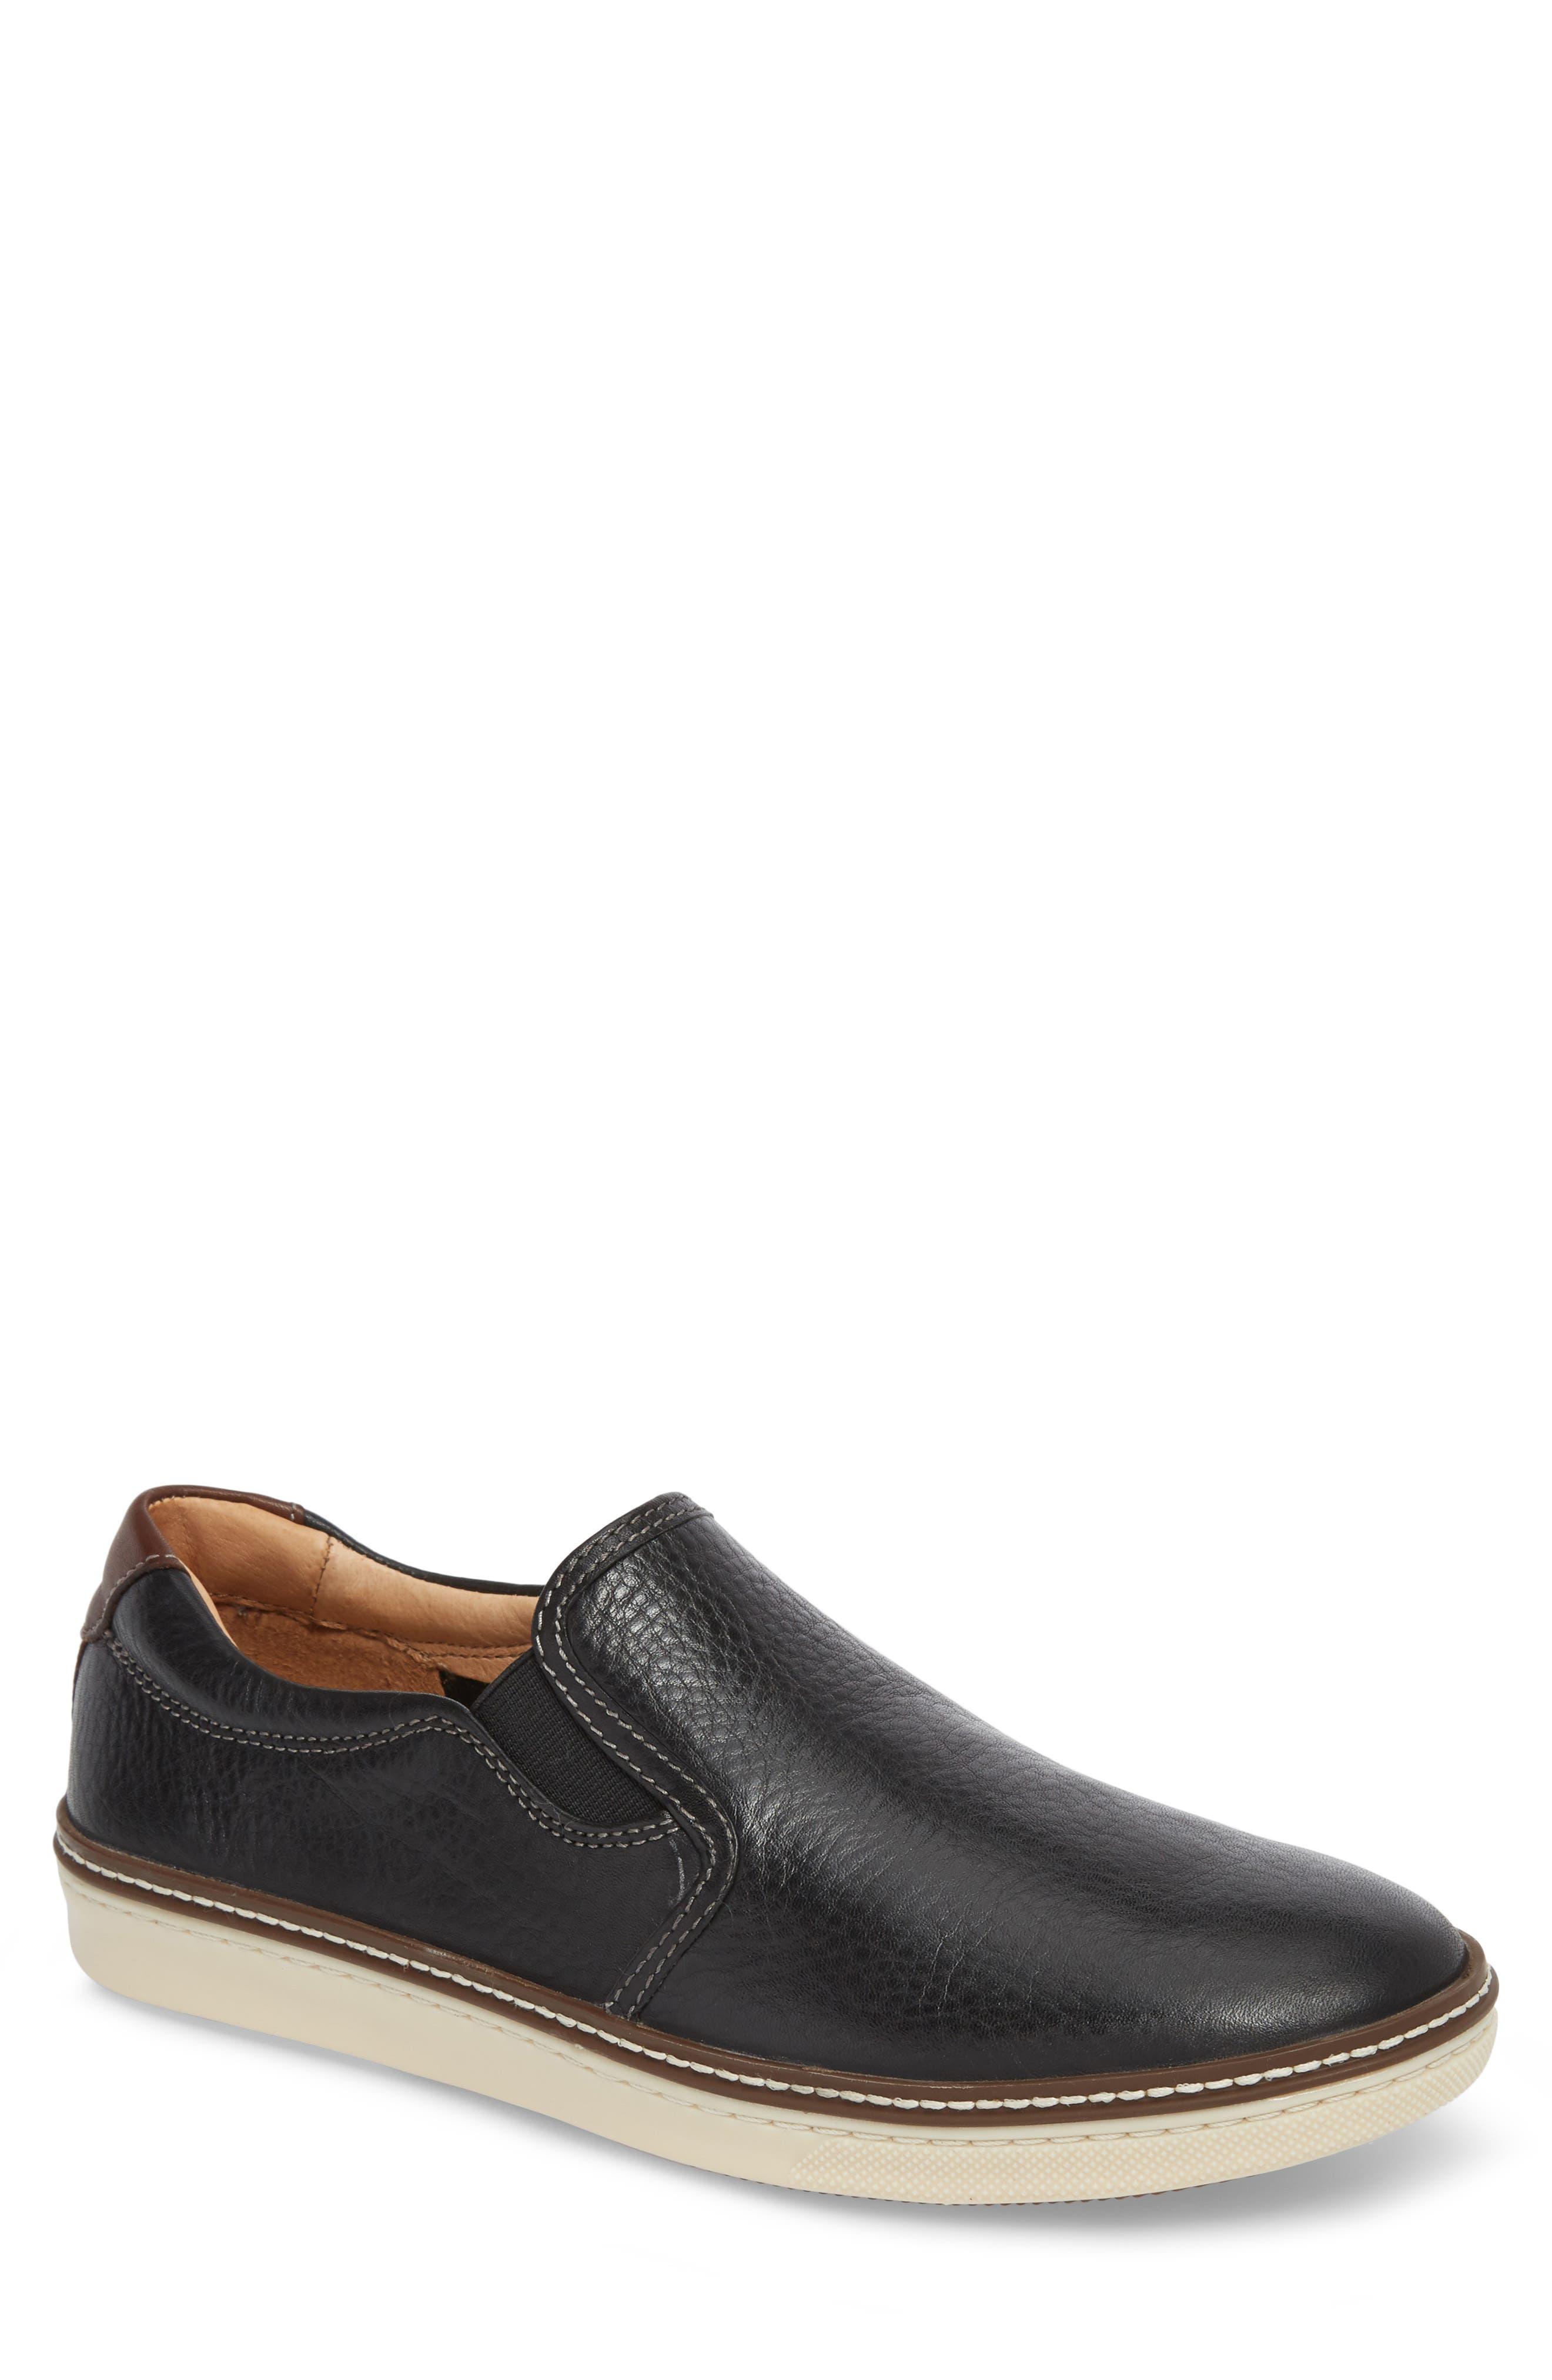 McGuffey Slip-On Sneaker,                         Main,                         color, Black Leather